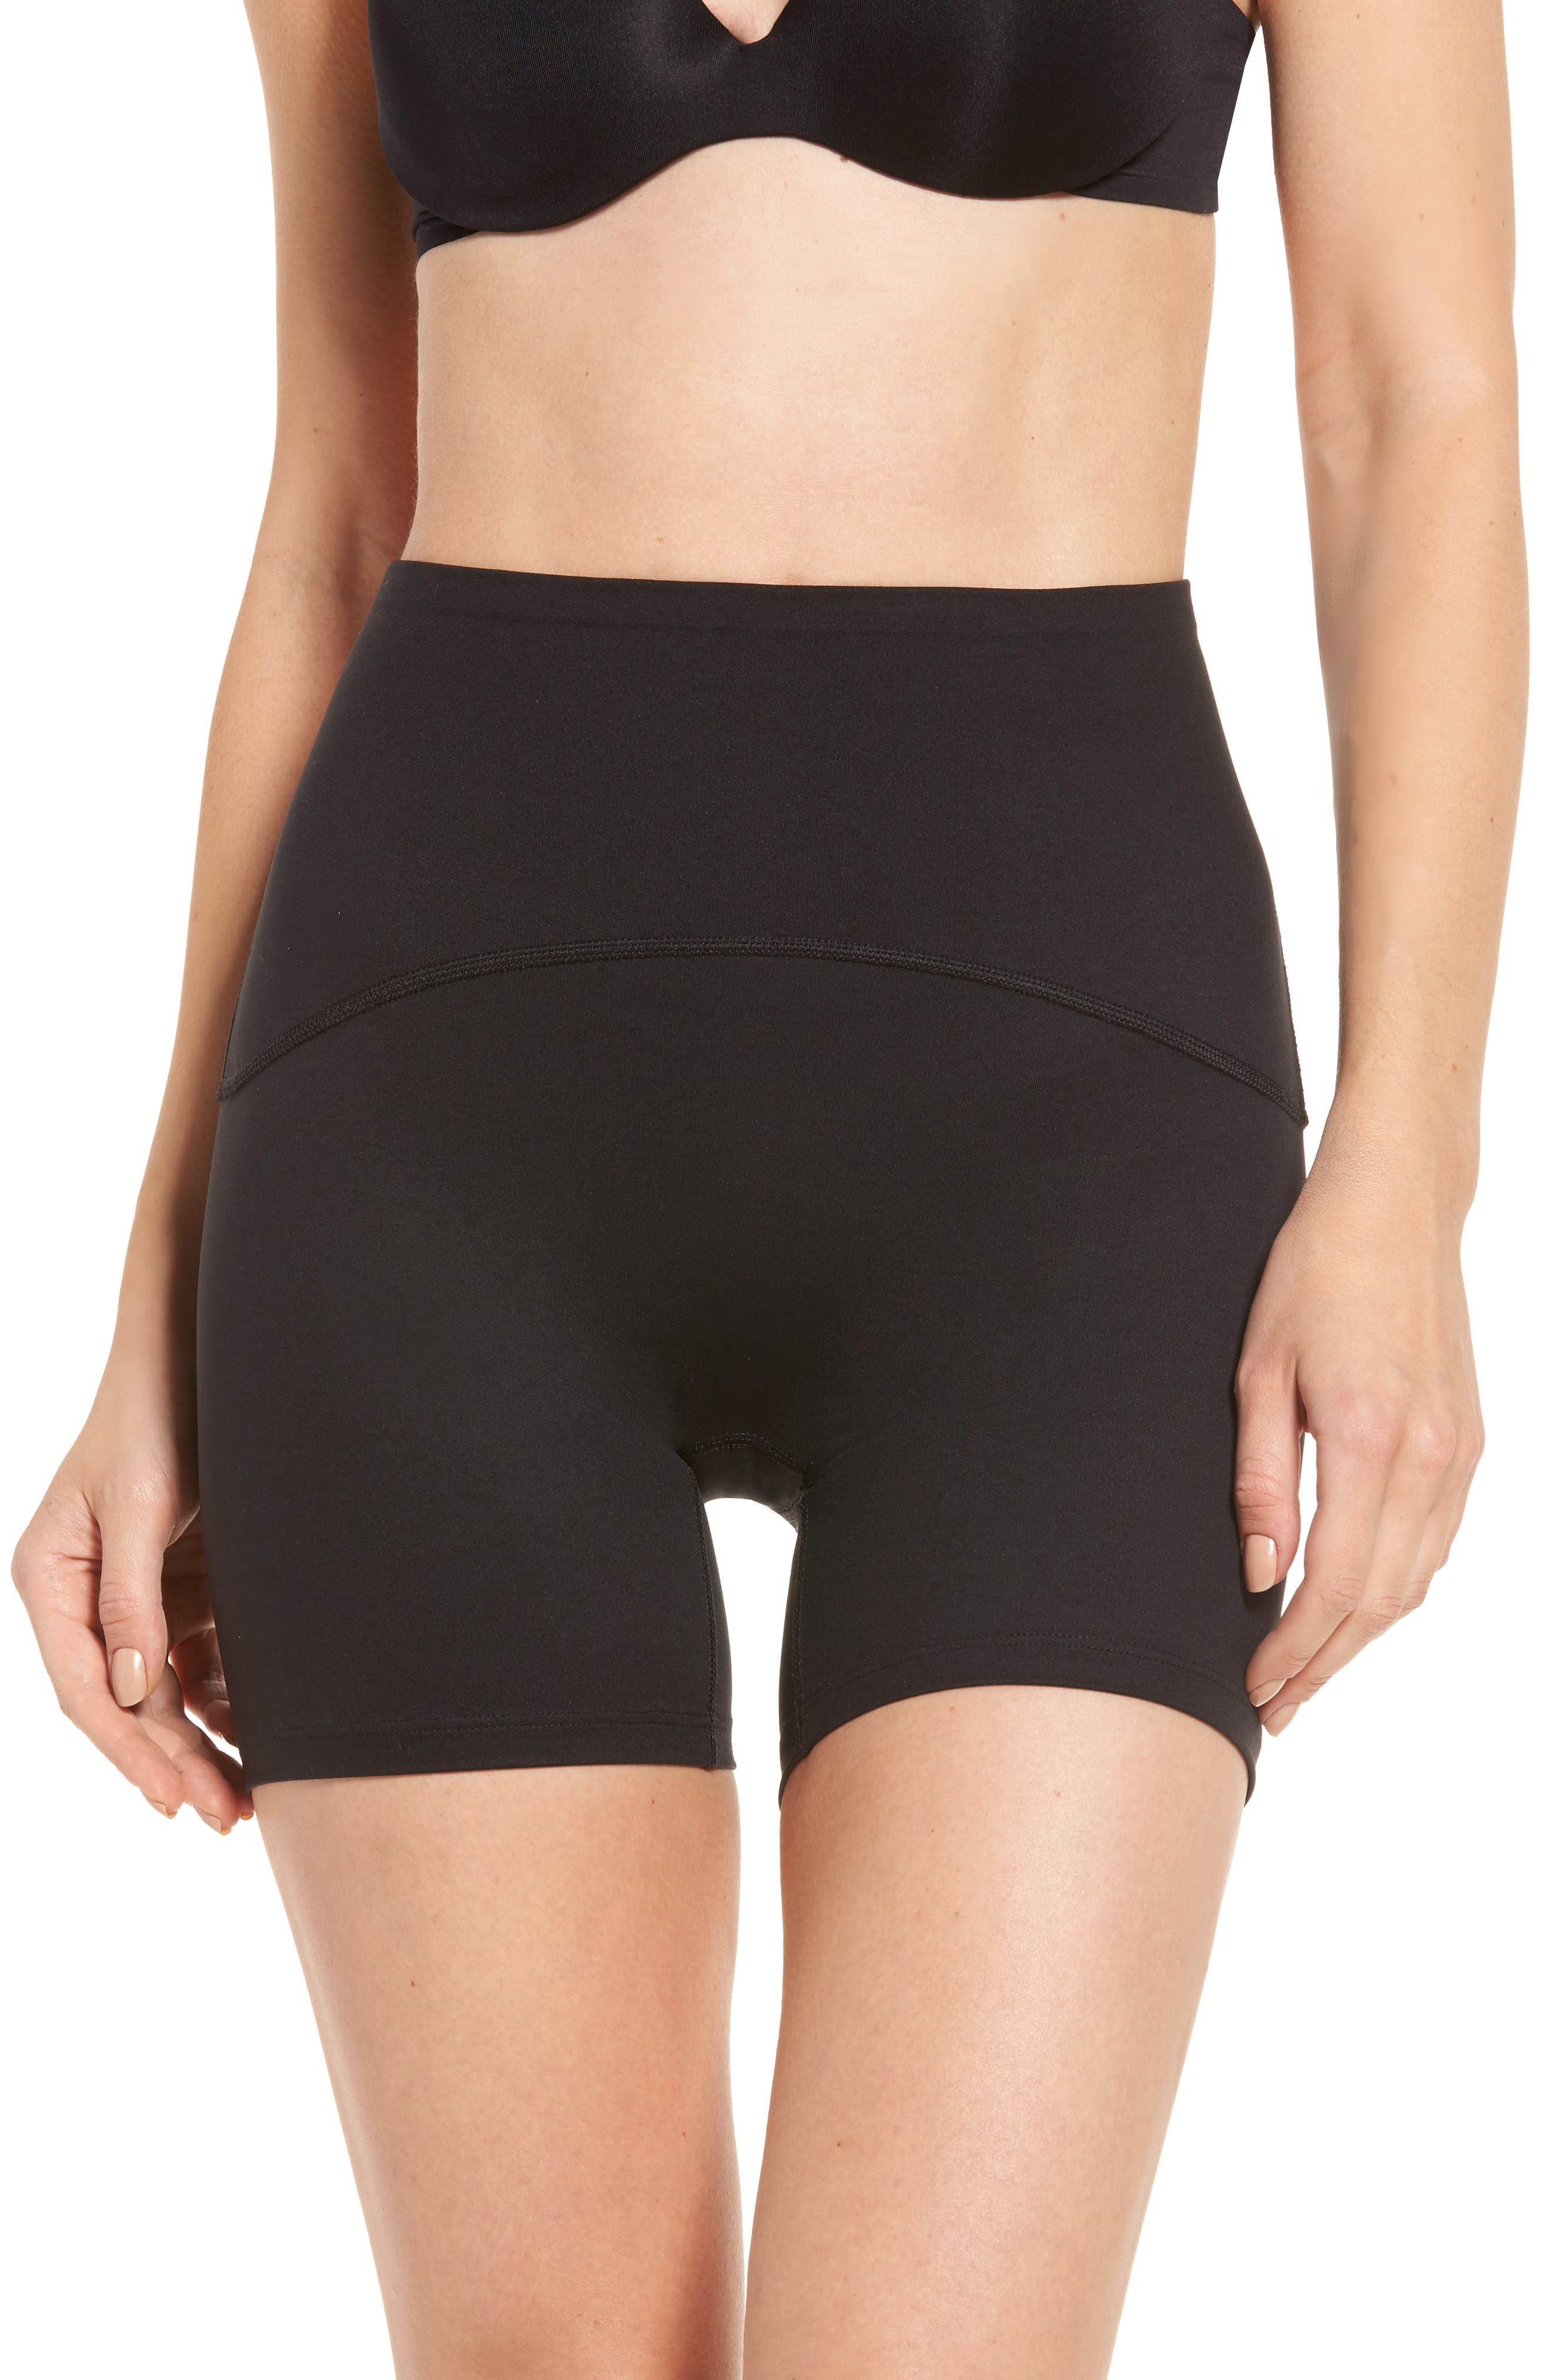 Sport Compression Shorts,                         Main,                         color, Black